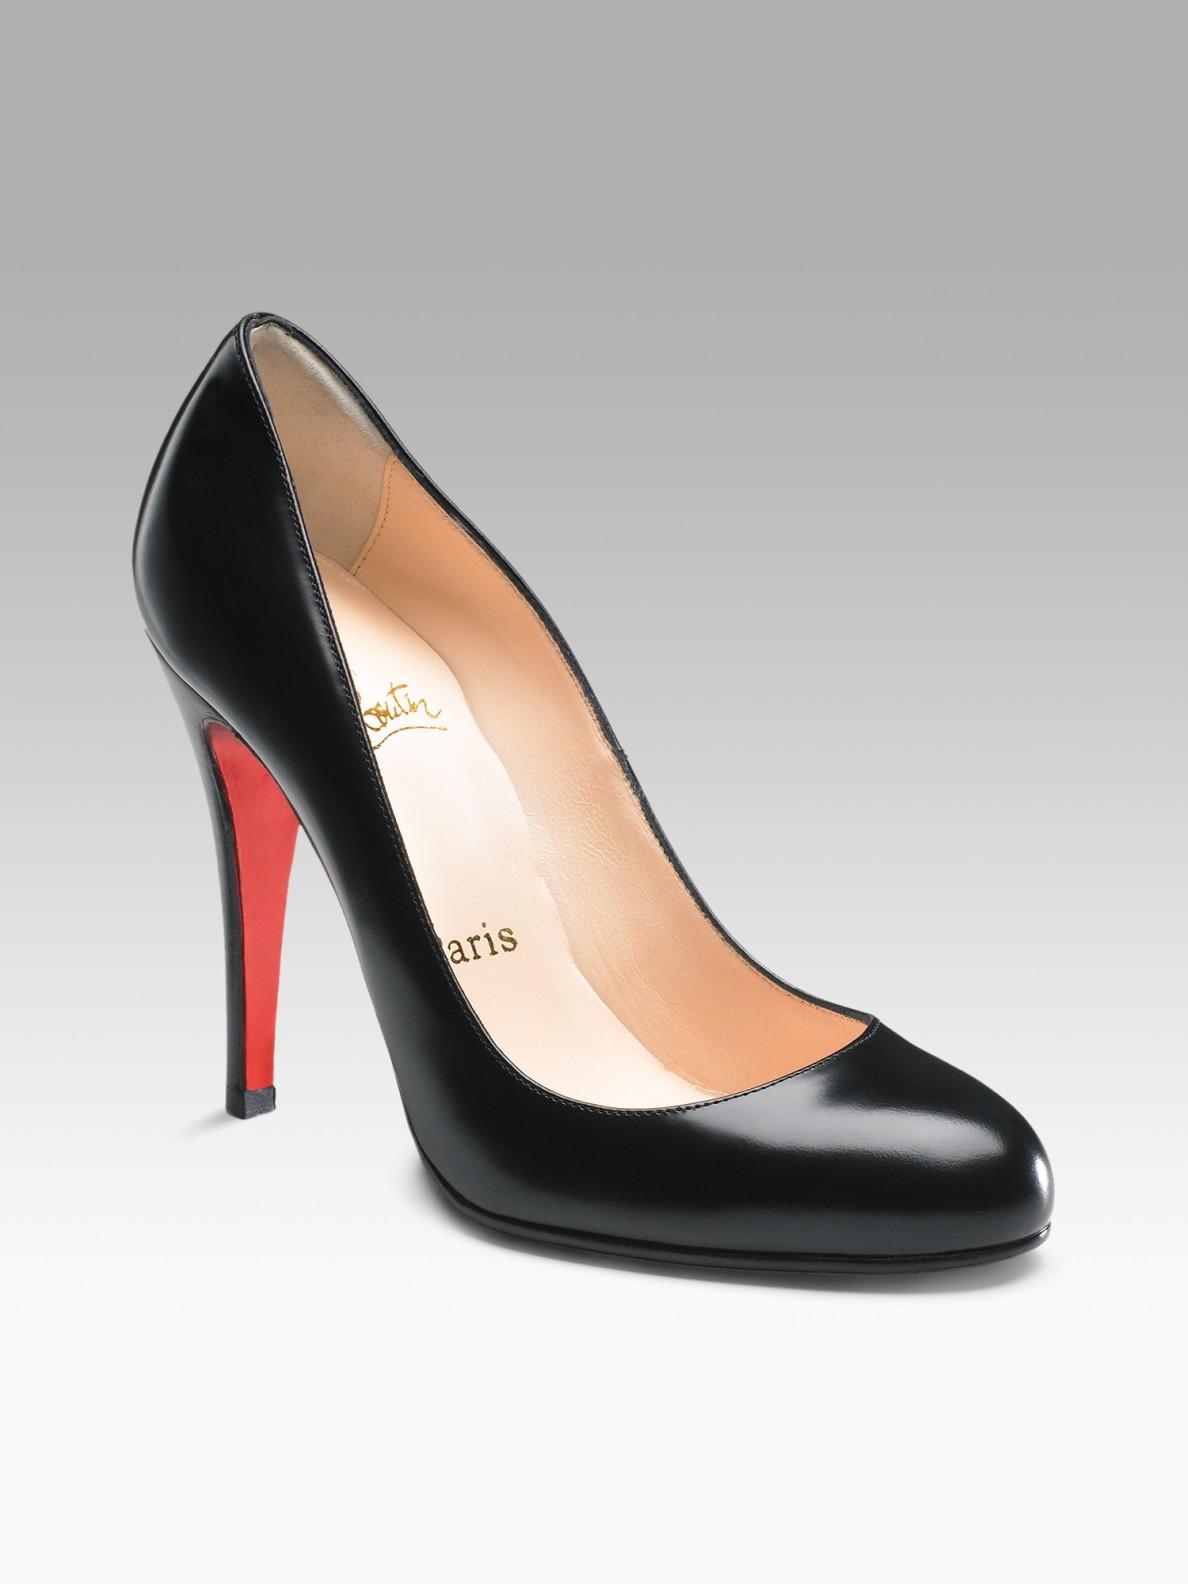 Christian Louboutin So Kate 120 mm (Black) - Shoes Post